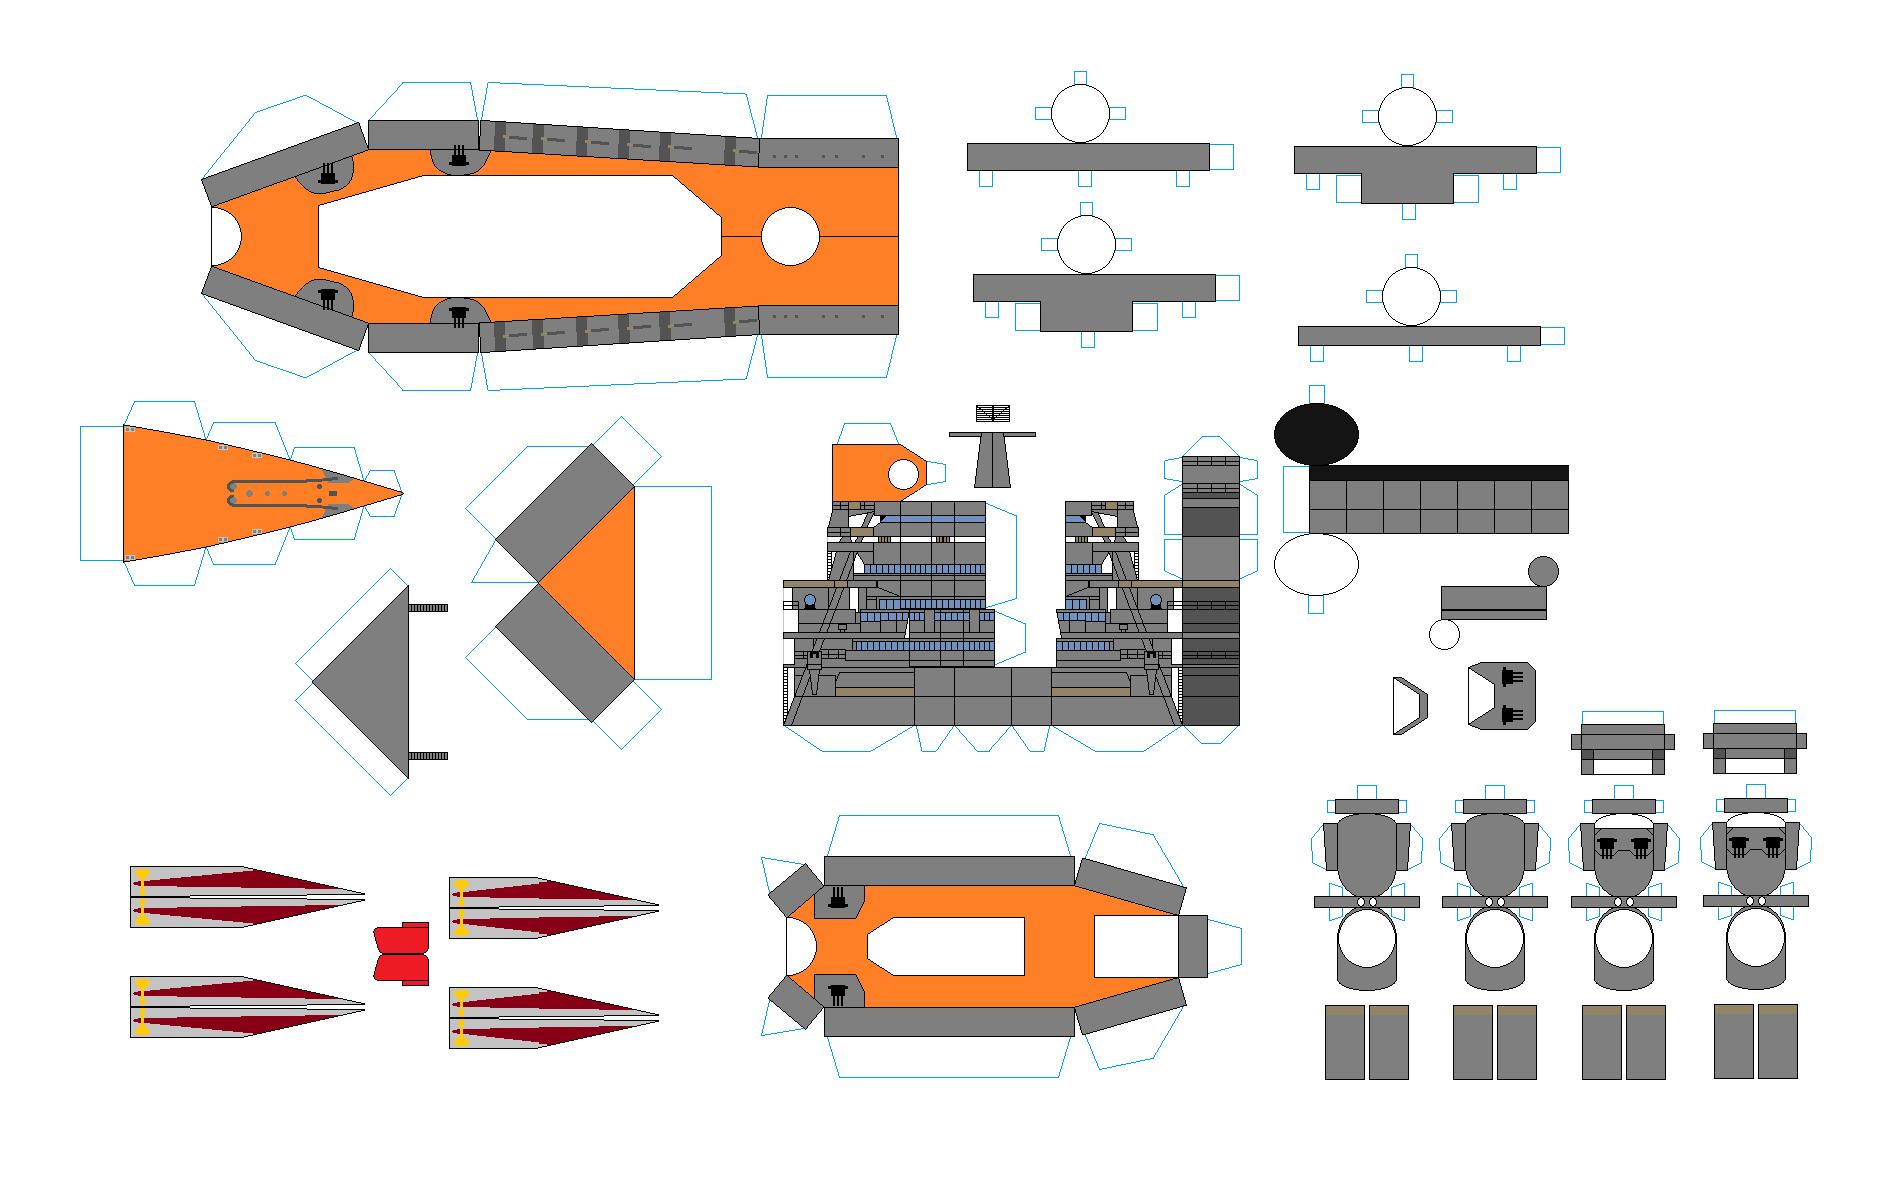 IJN Hybrid Battleship ISE Class by MegaMoonLiner on DeviantArt